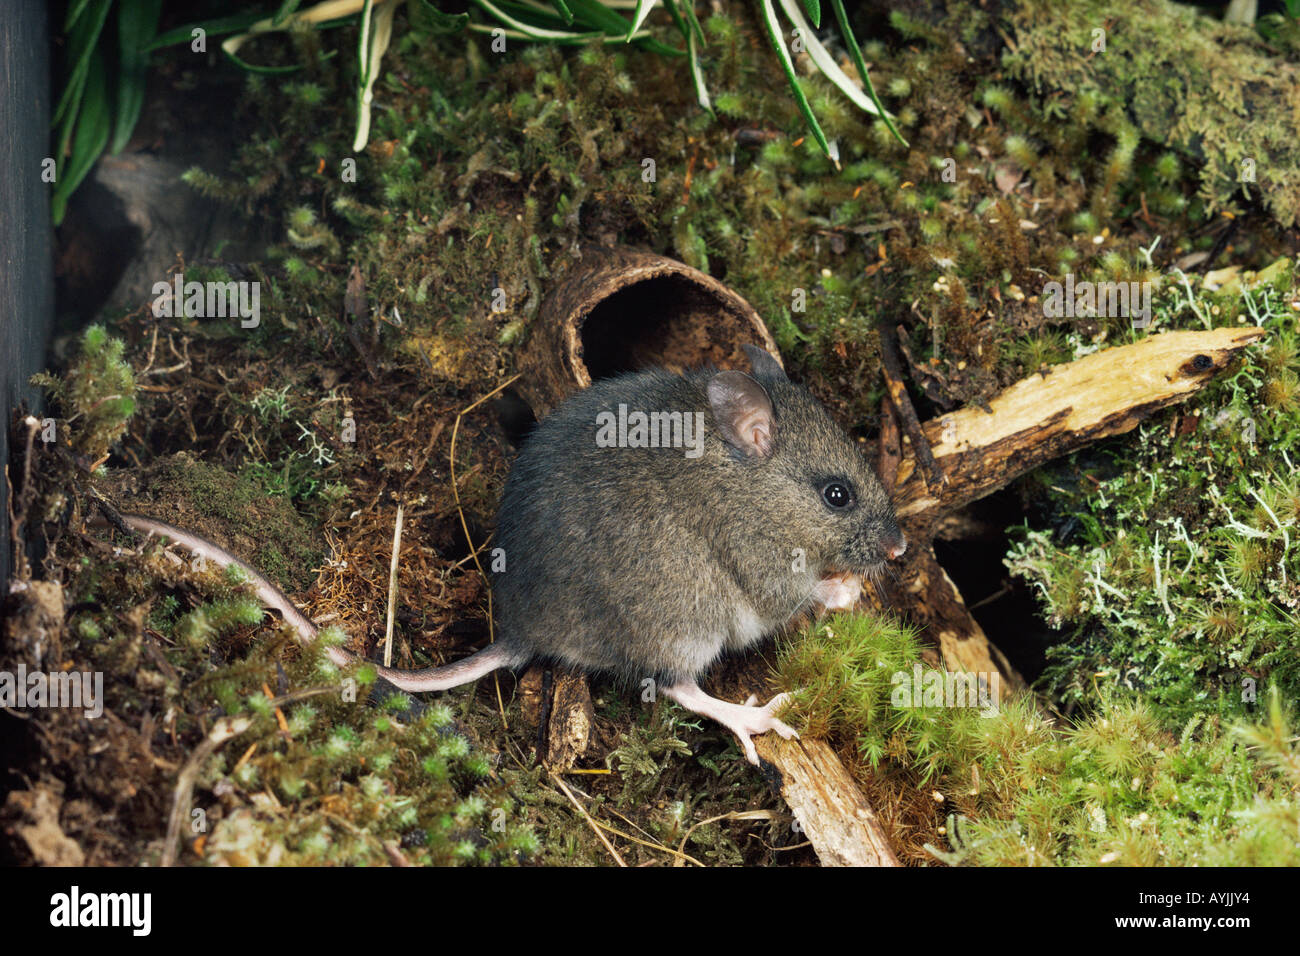 http://c8.alamy.com/comp/AYJJY4/long-tailed-mouse-pseudomys-higginsi-tasmanian-endemic-photographed-AYJJY4.jpg